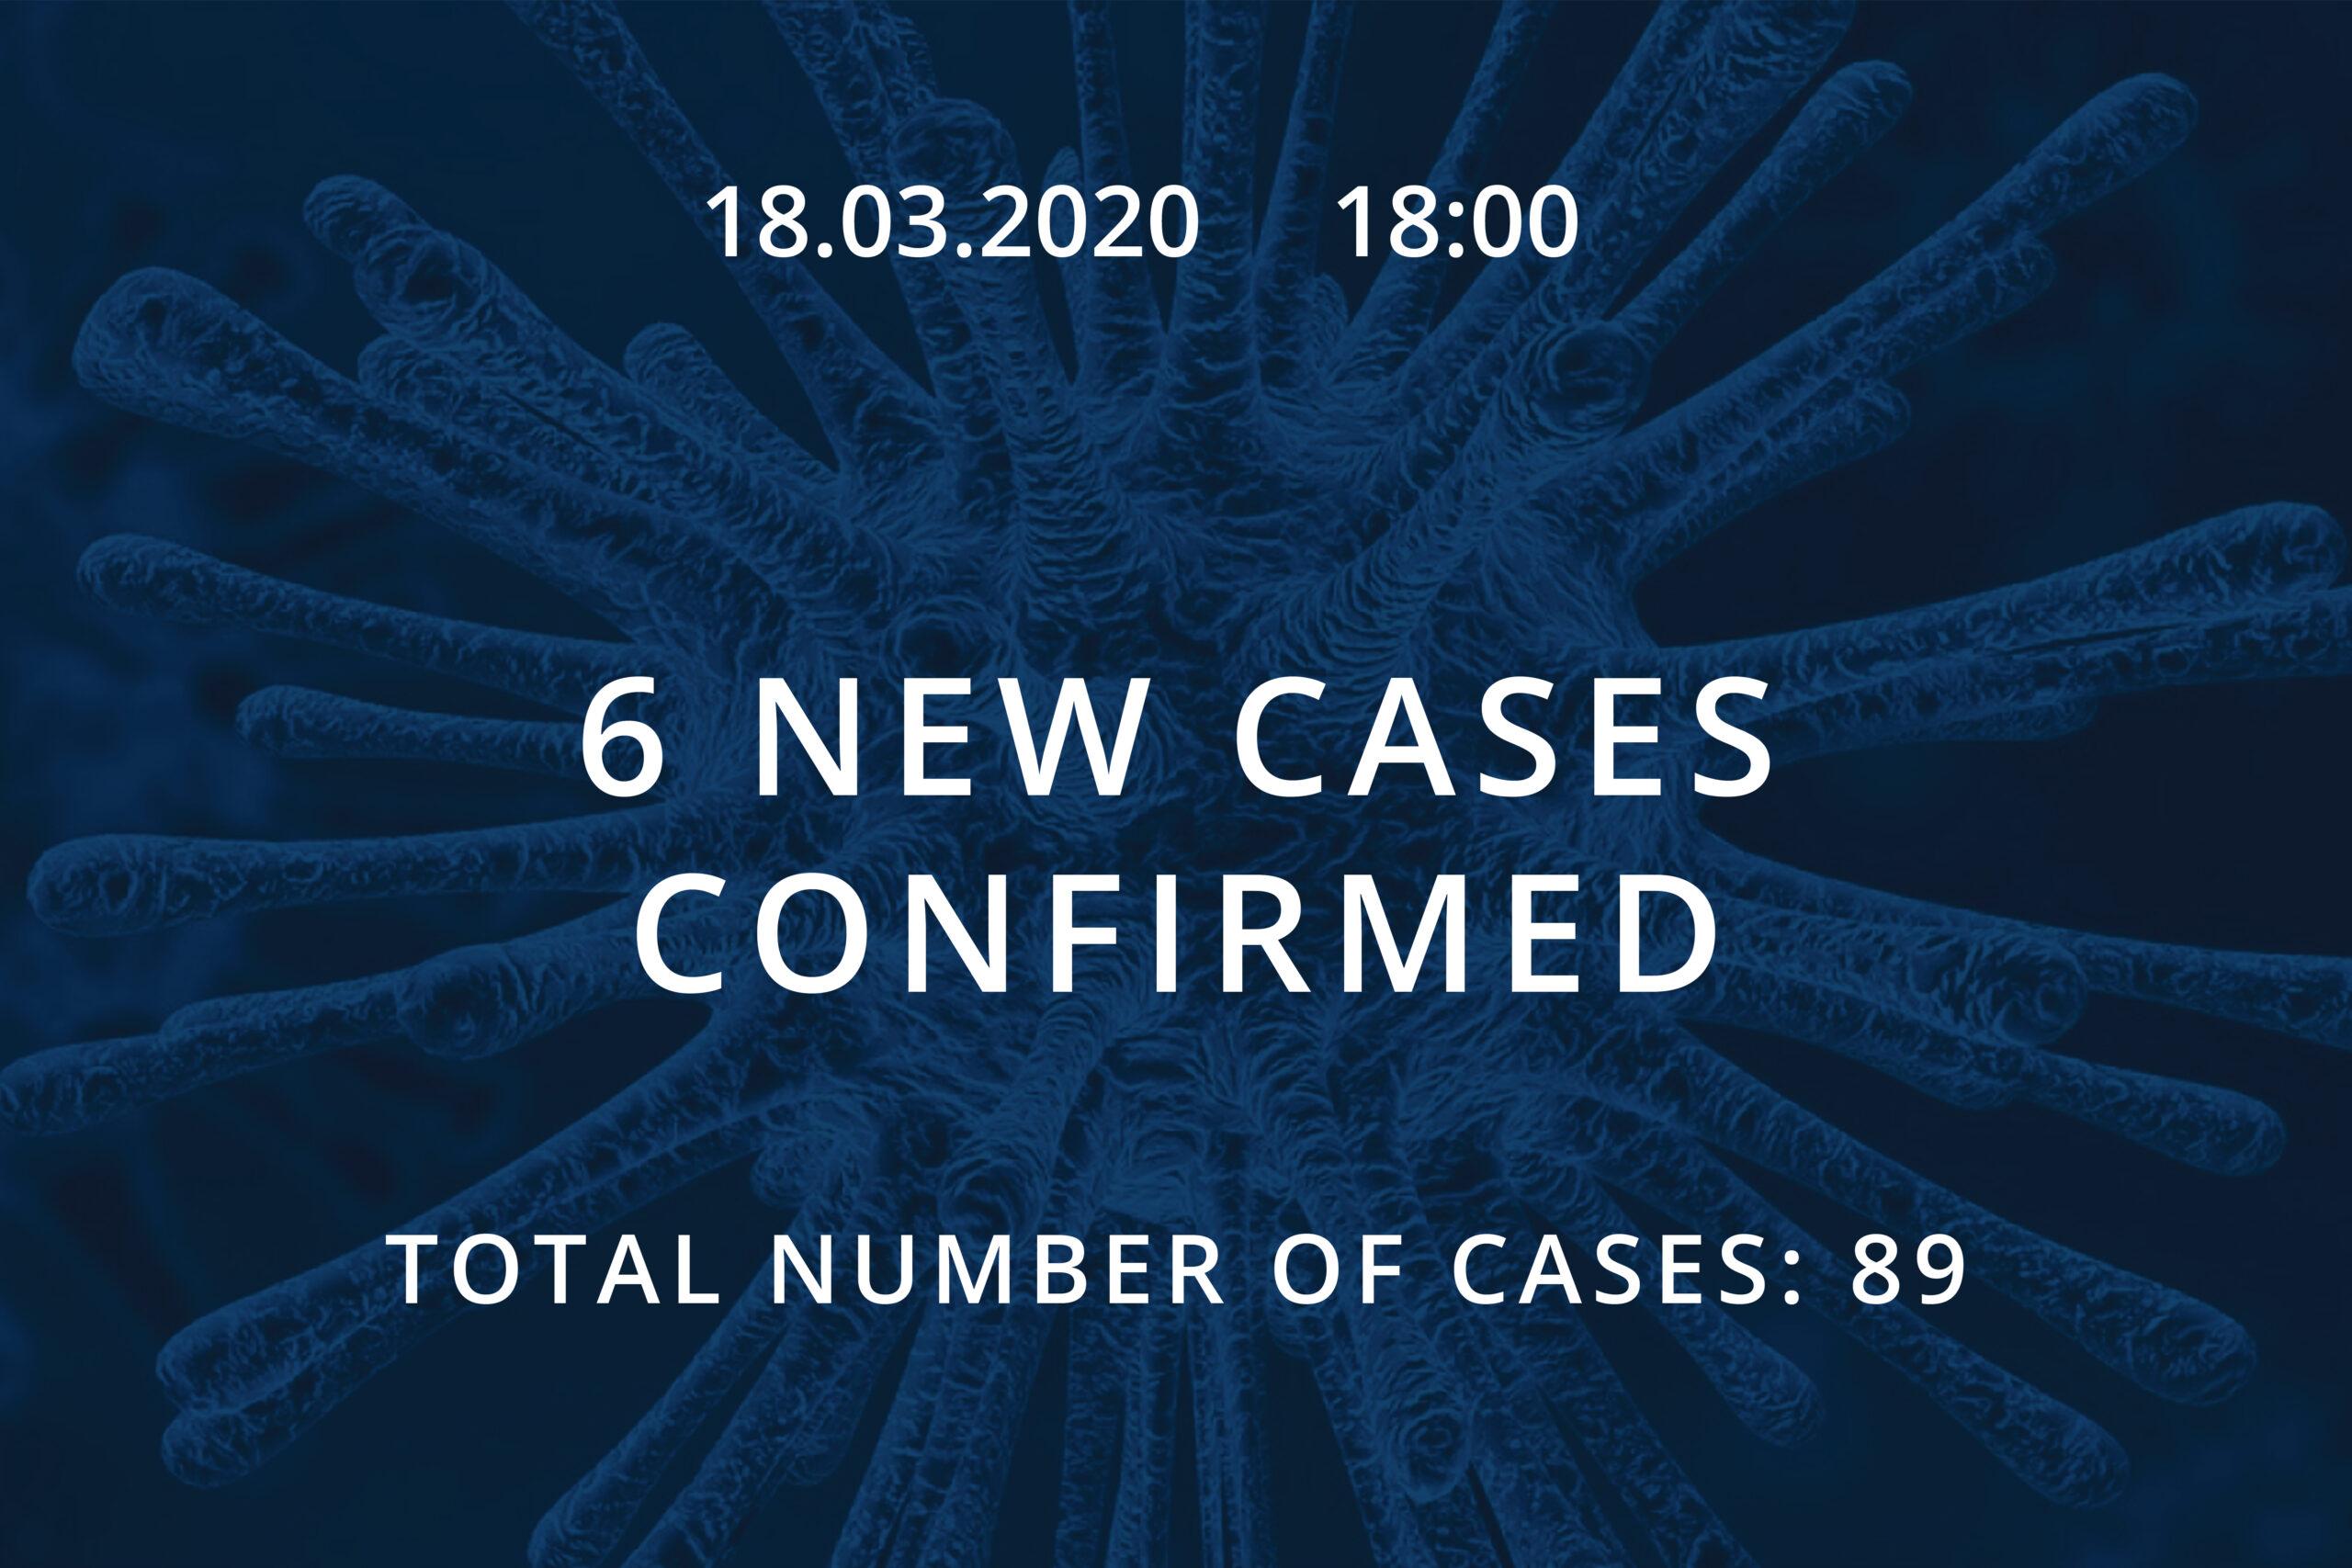 Information about coronavirus COVID-19, 18.03.2020 at 18:00